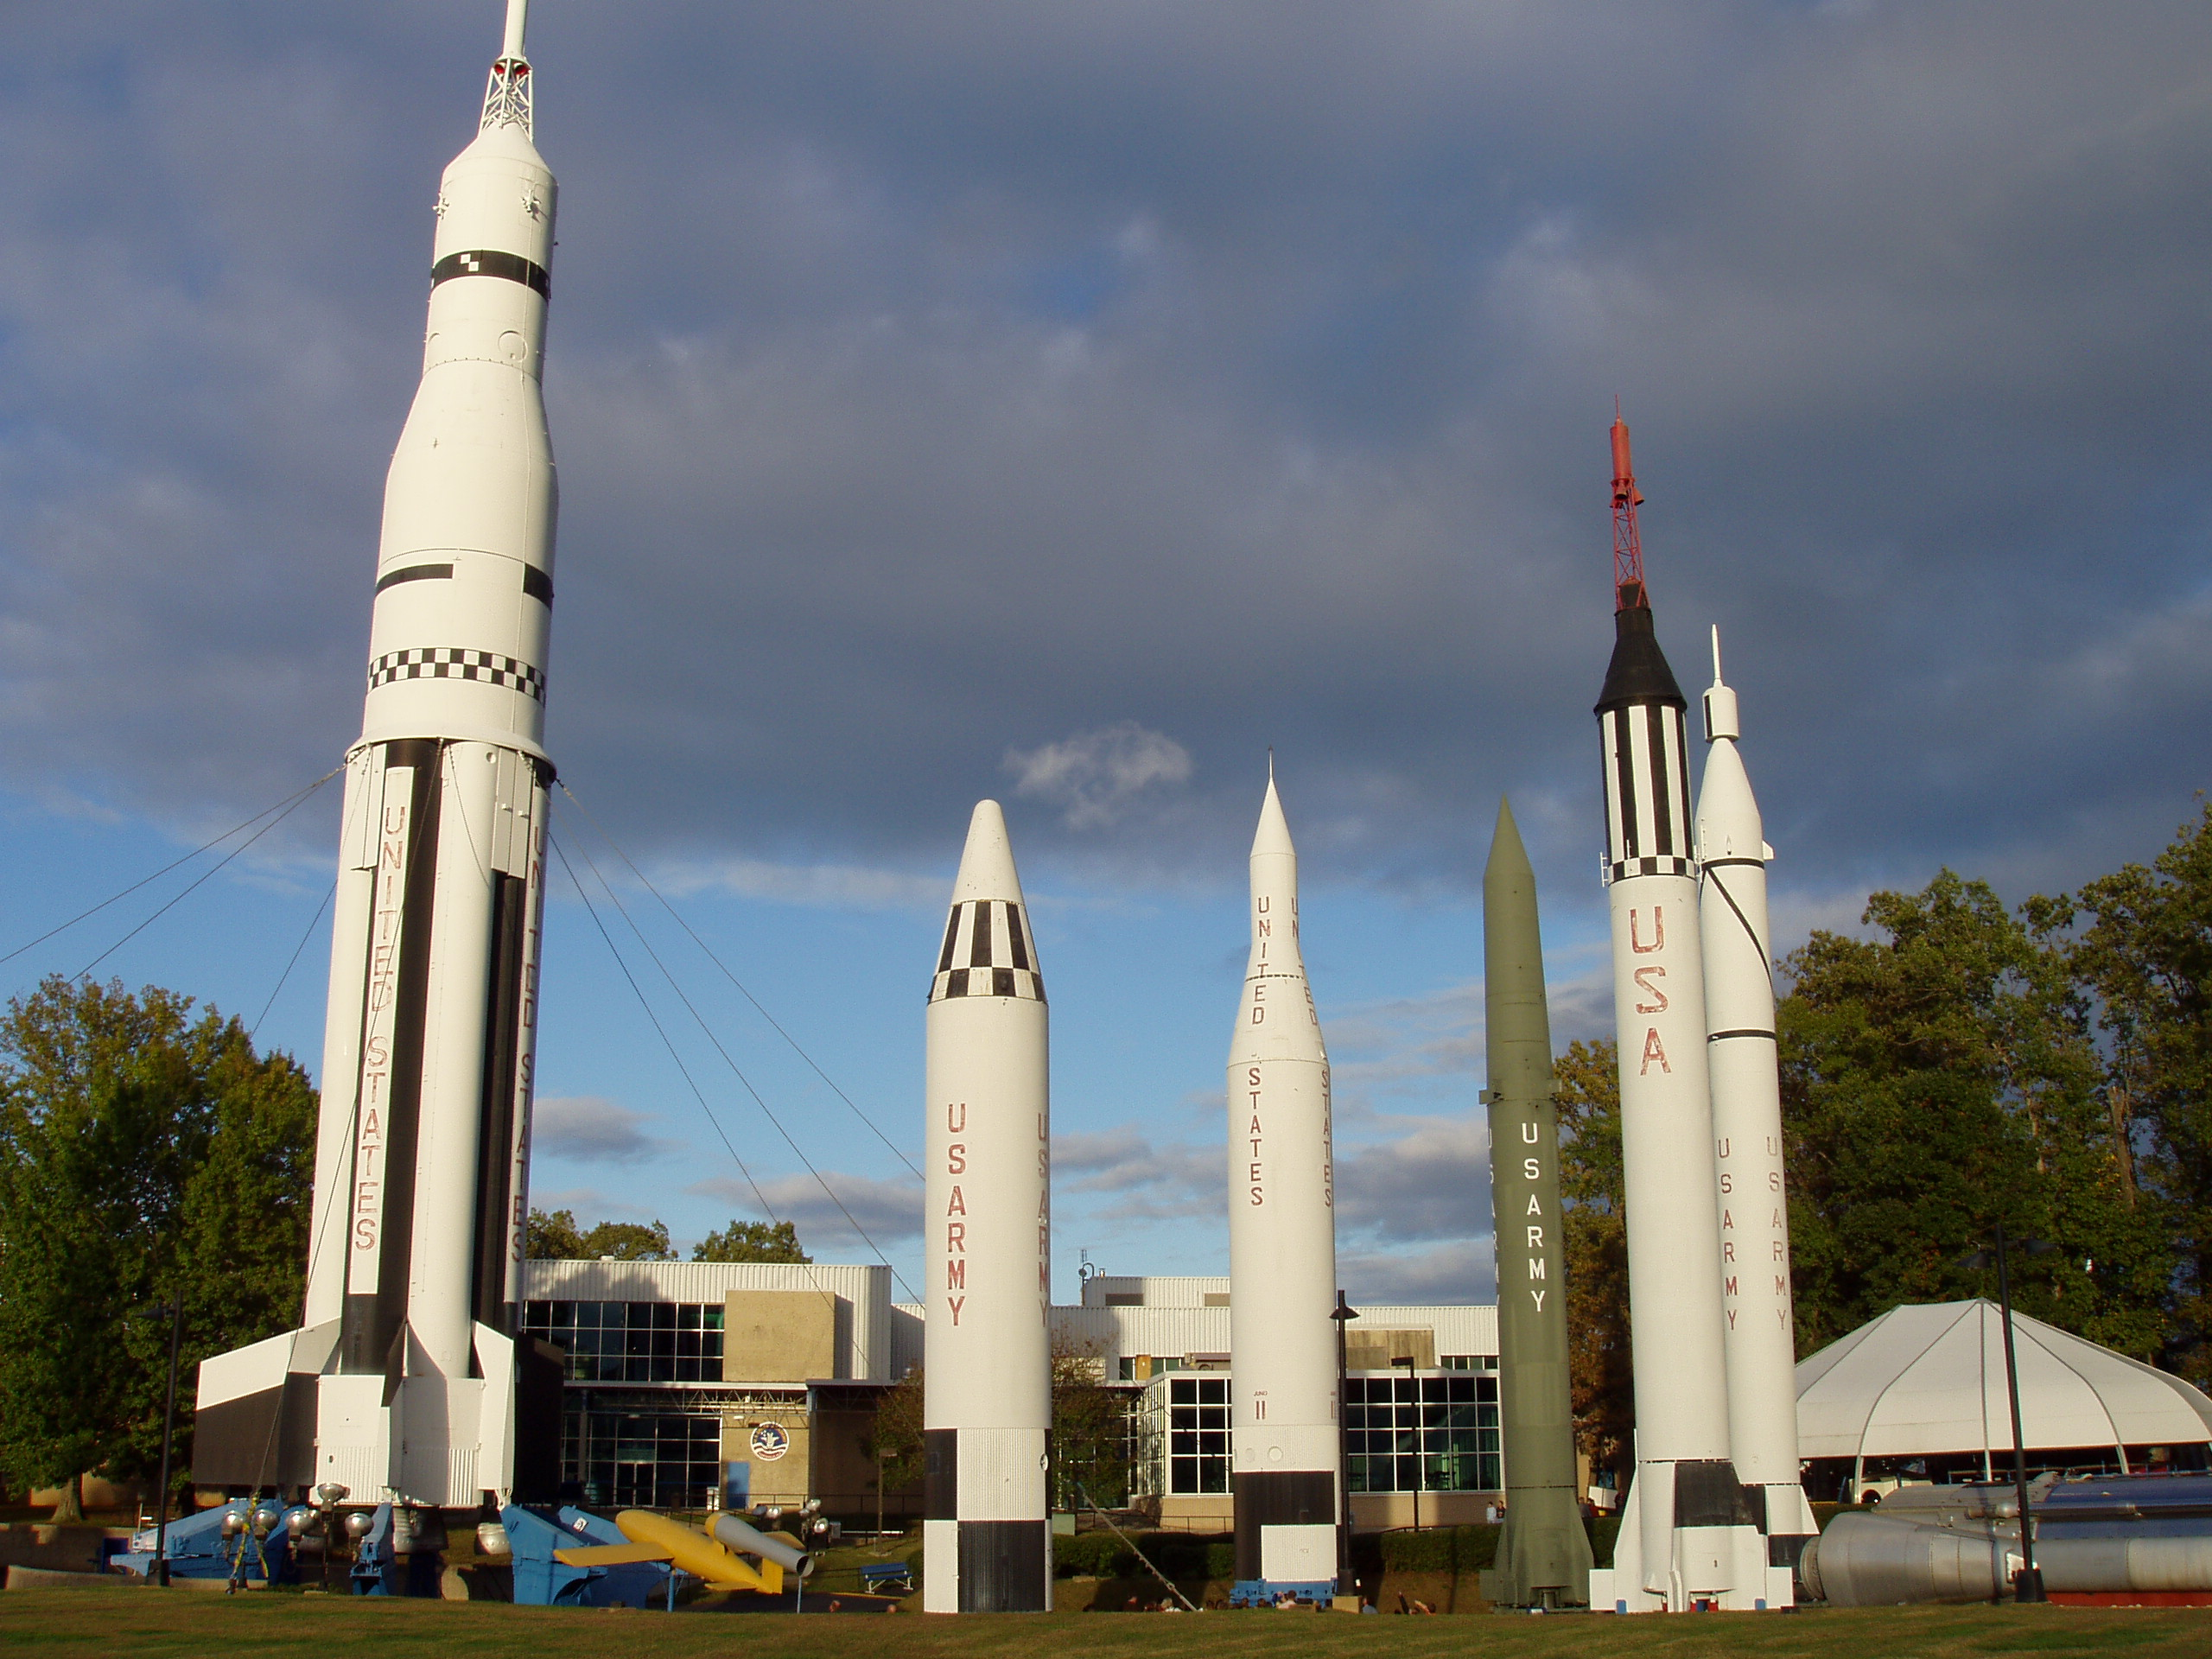 Rockets_in_Huntsville_Alabama